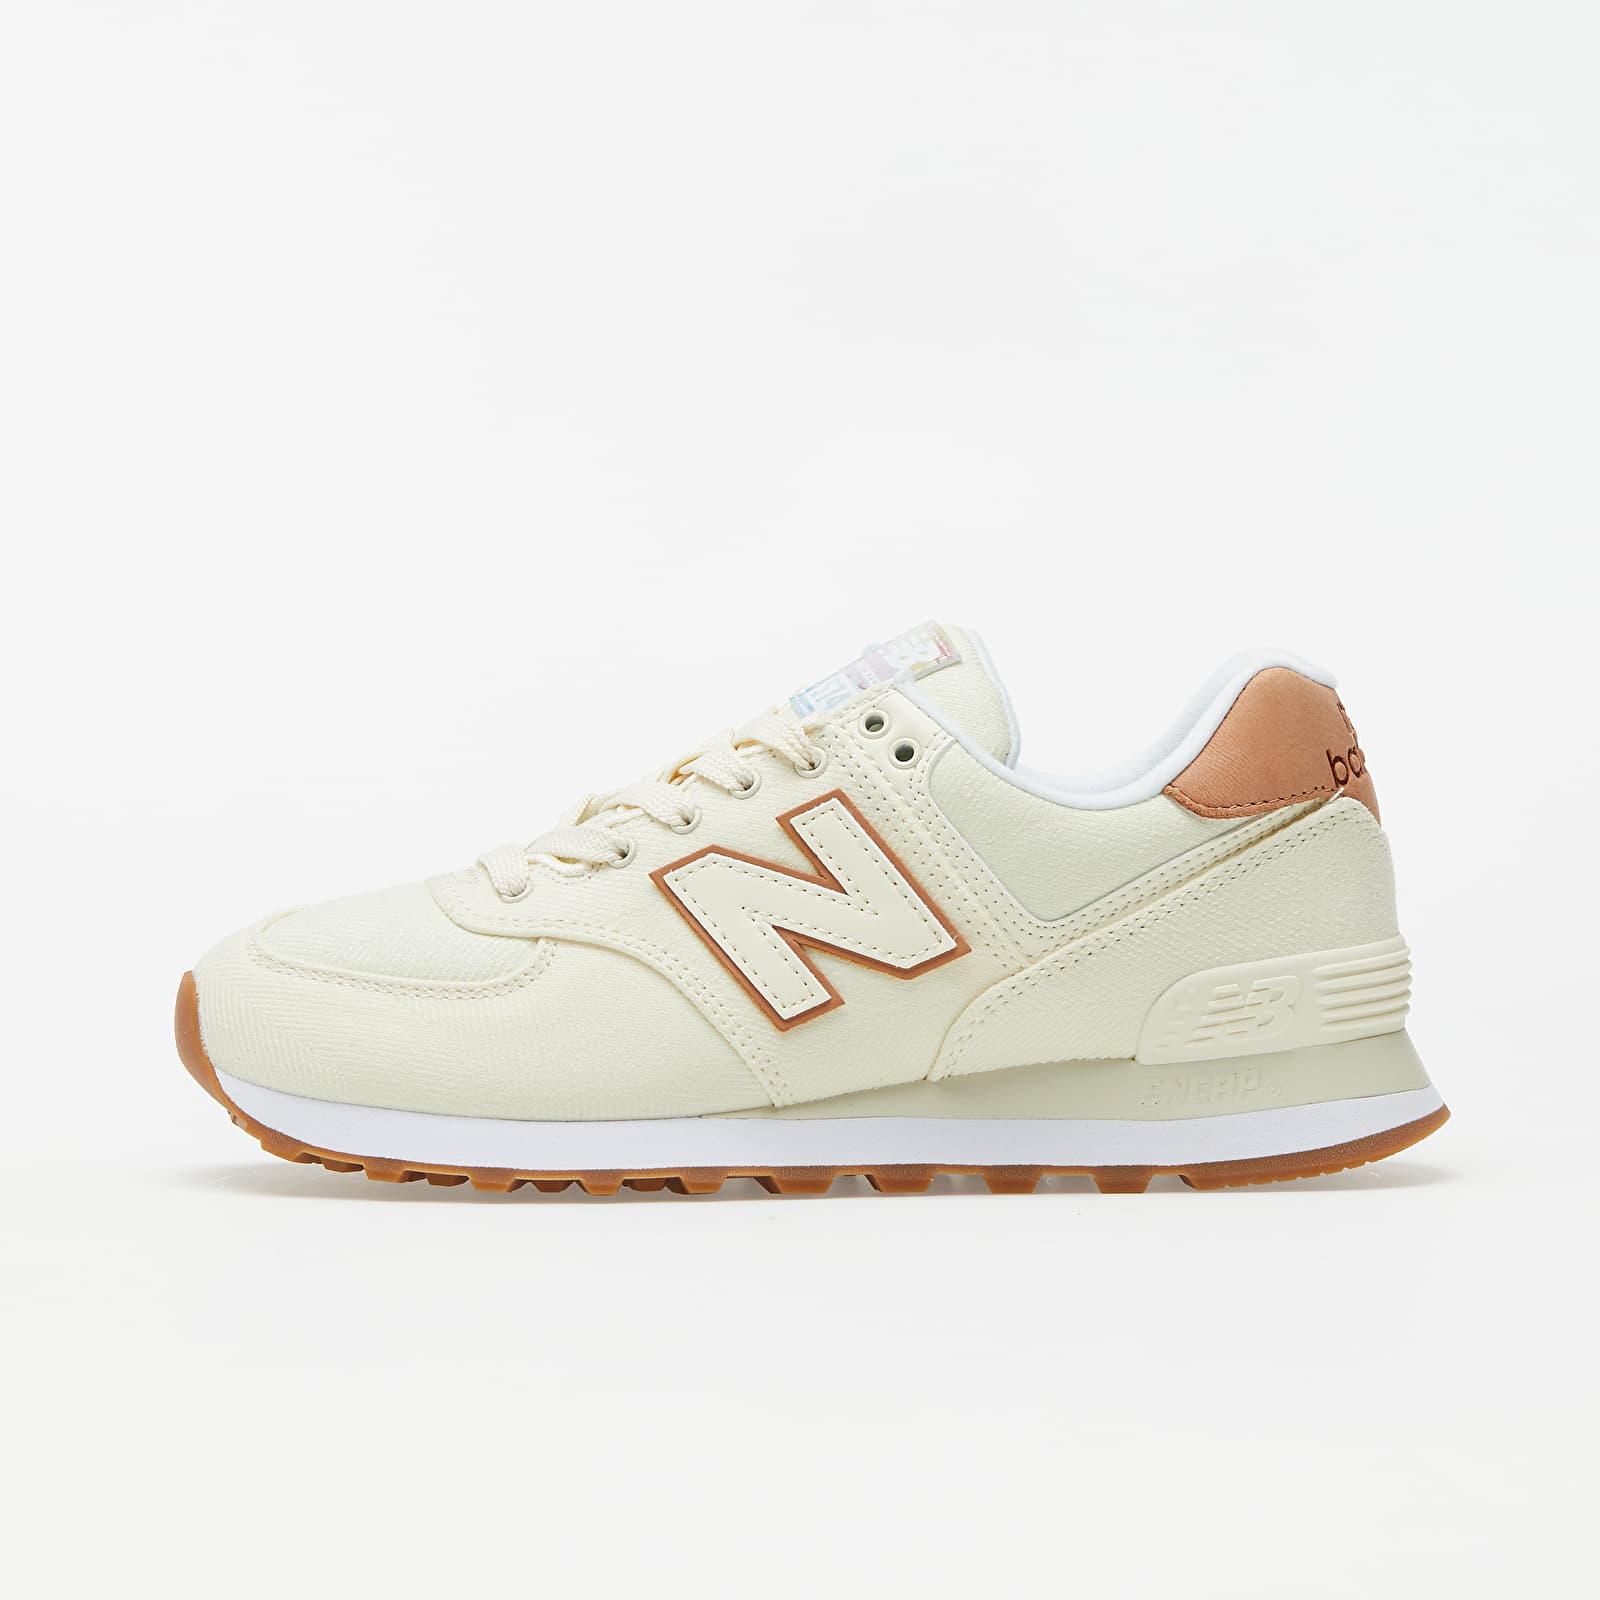 New Balance 574 Beige WL574SCB